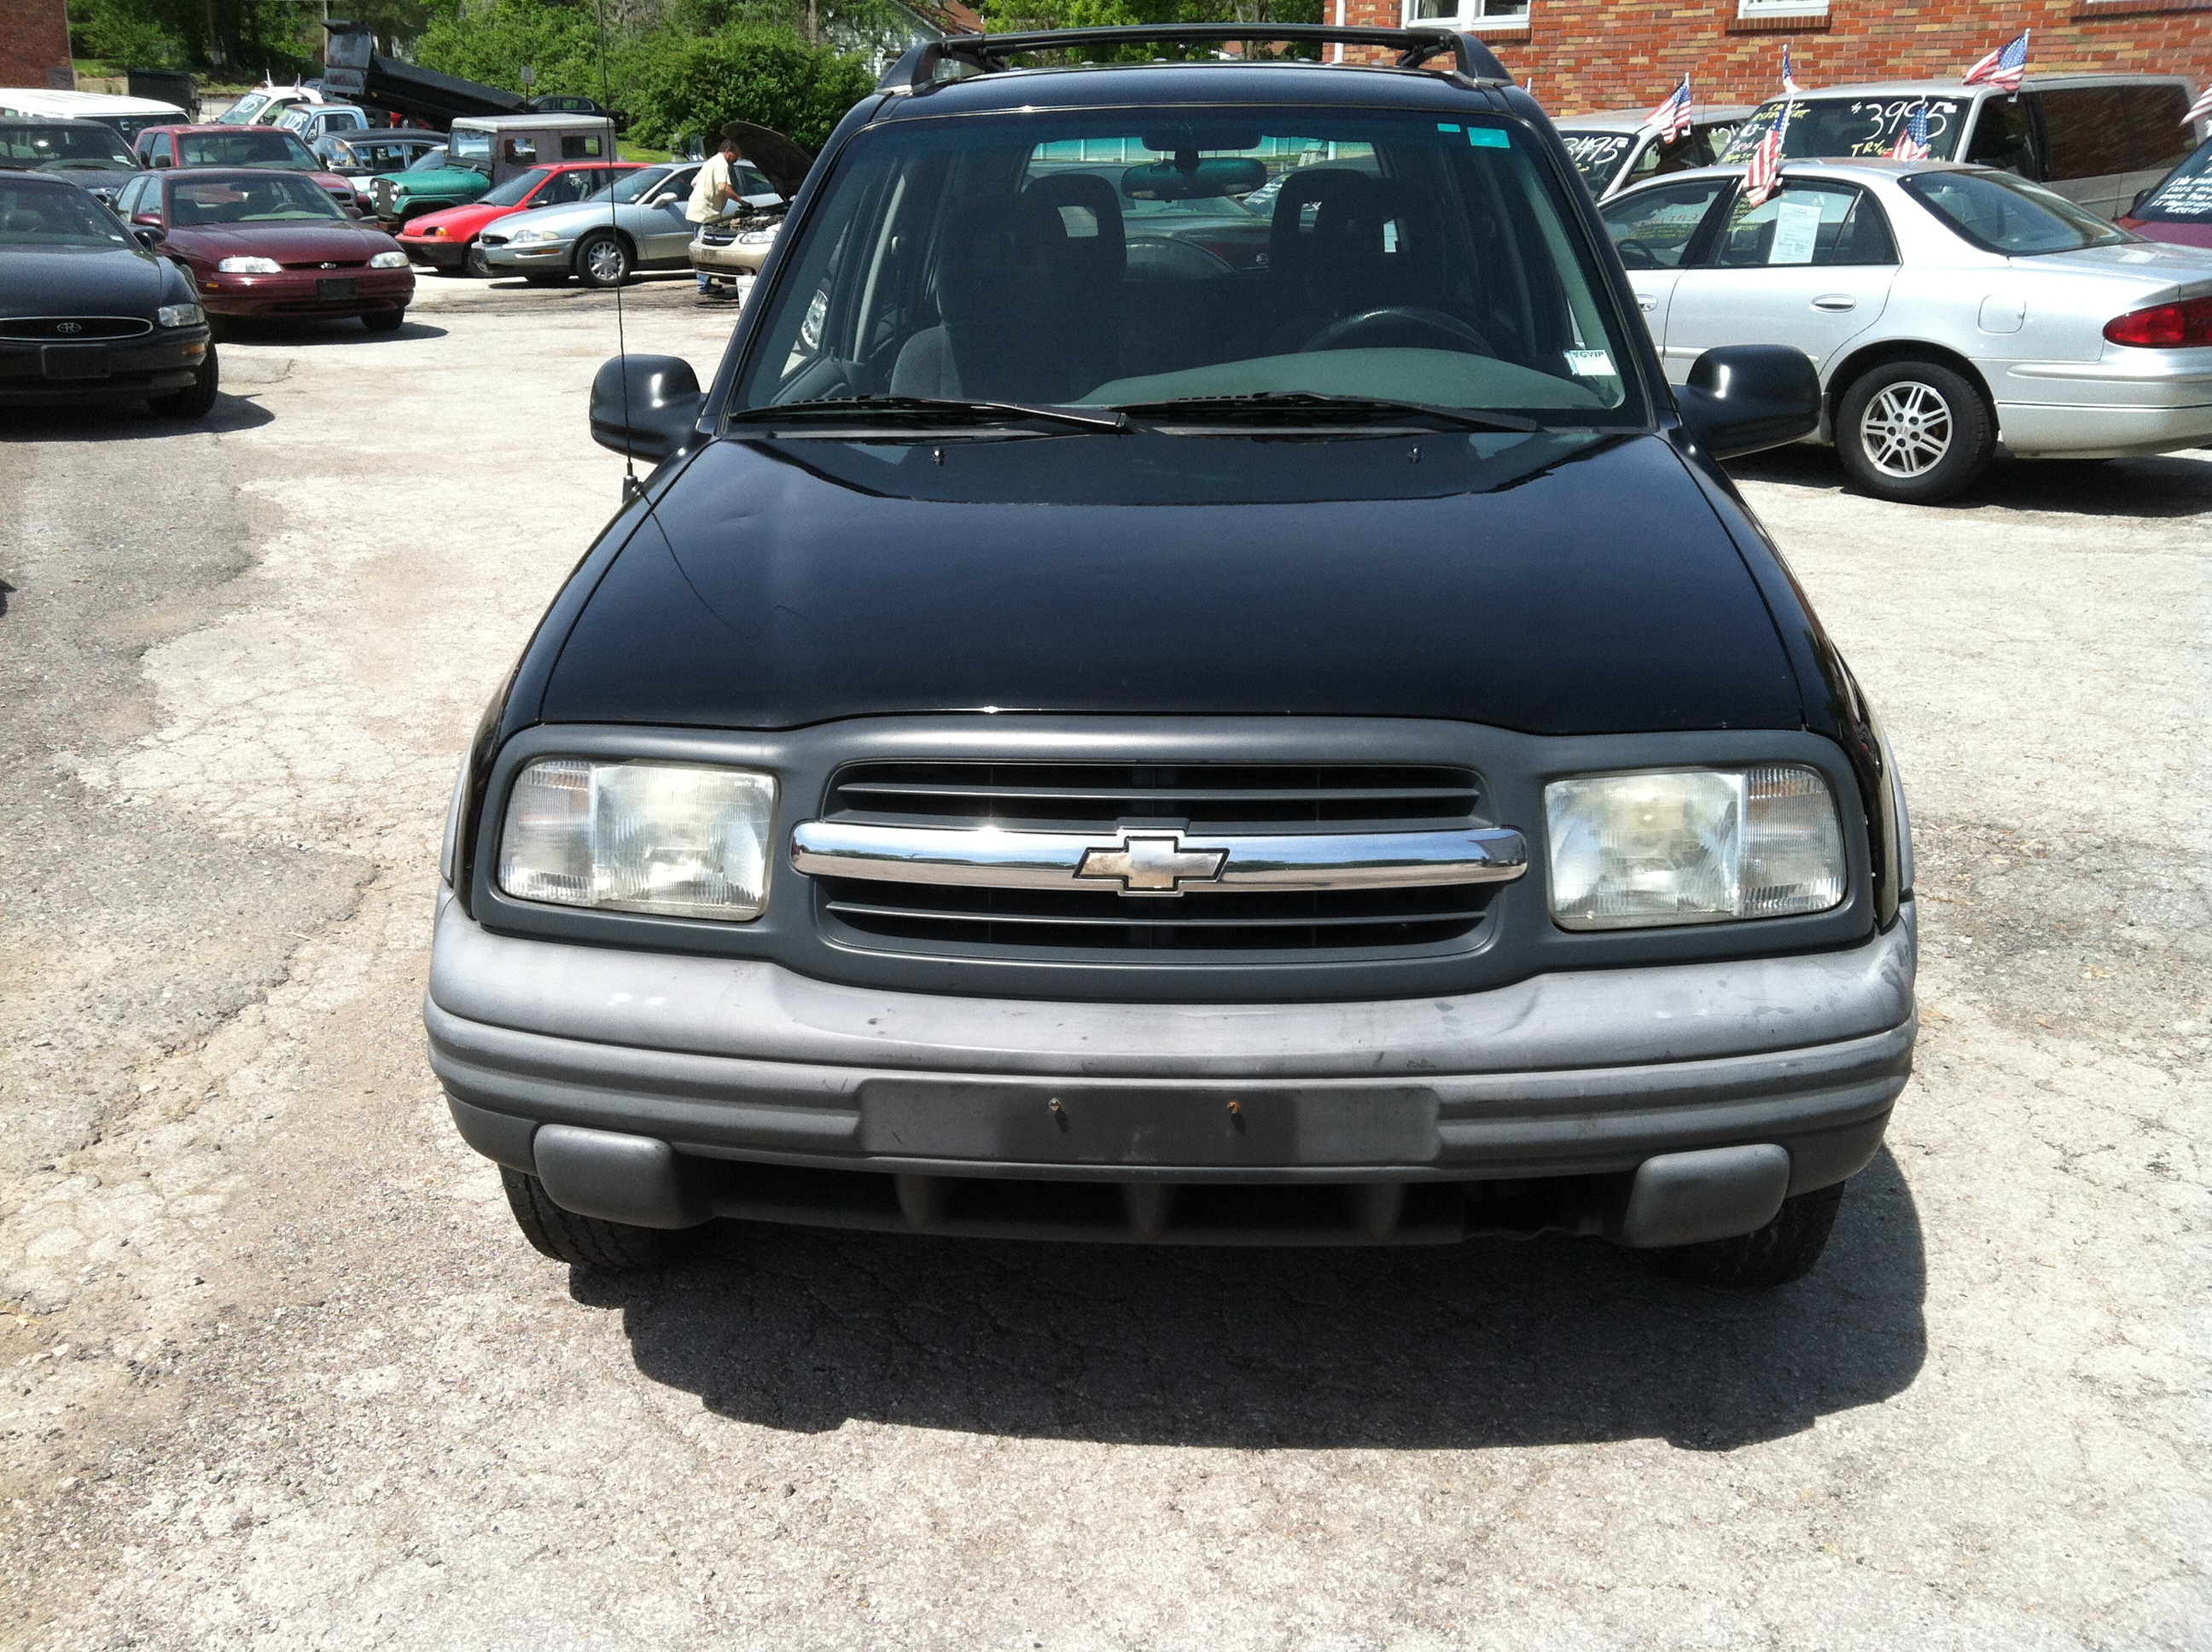 Mud Trucks For Sale In Missouri.html | Autos Weblog